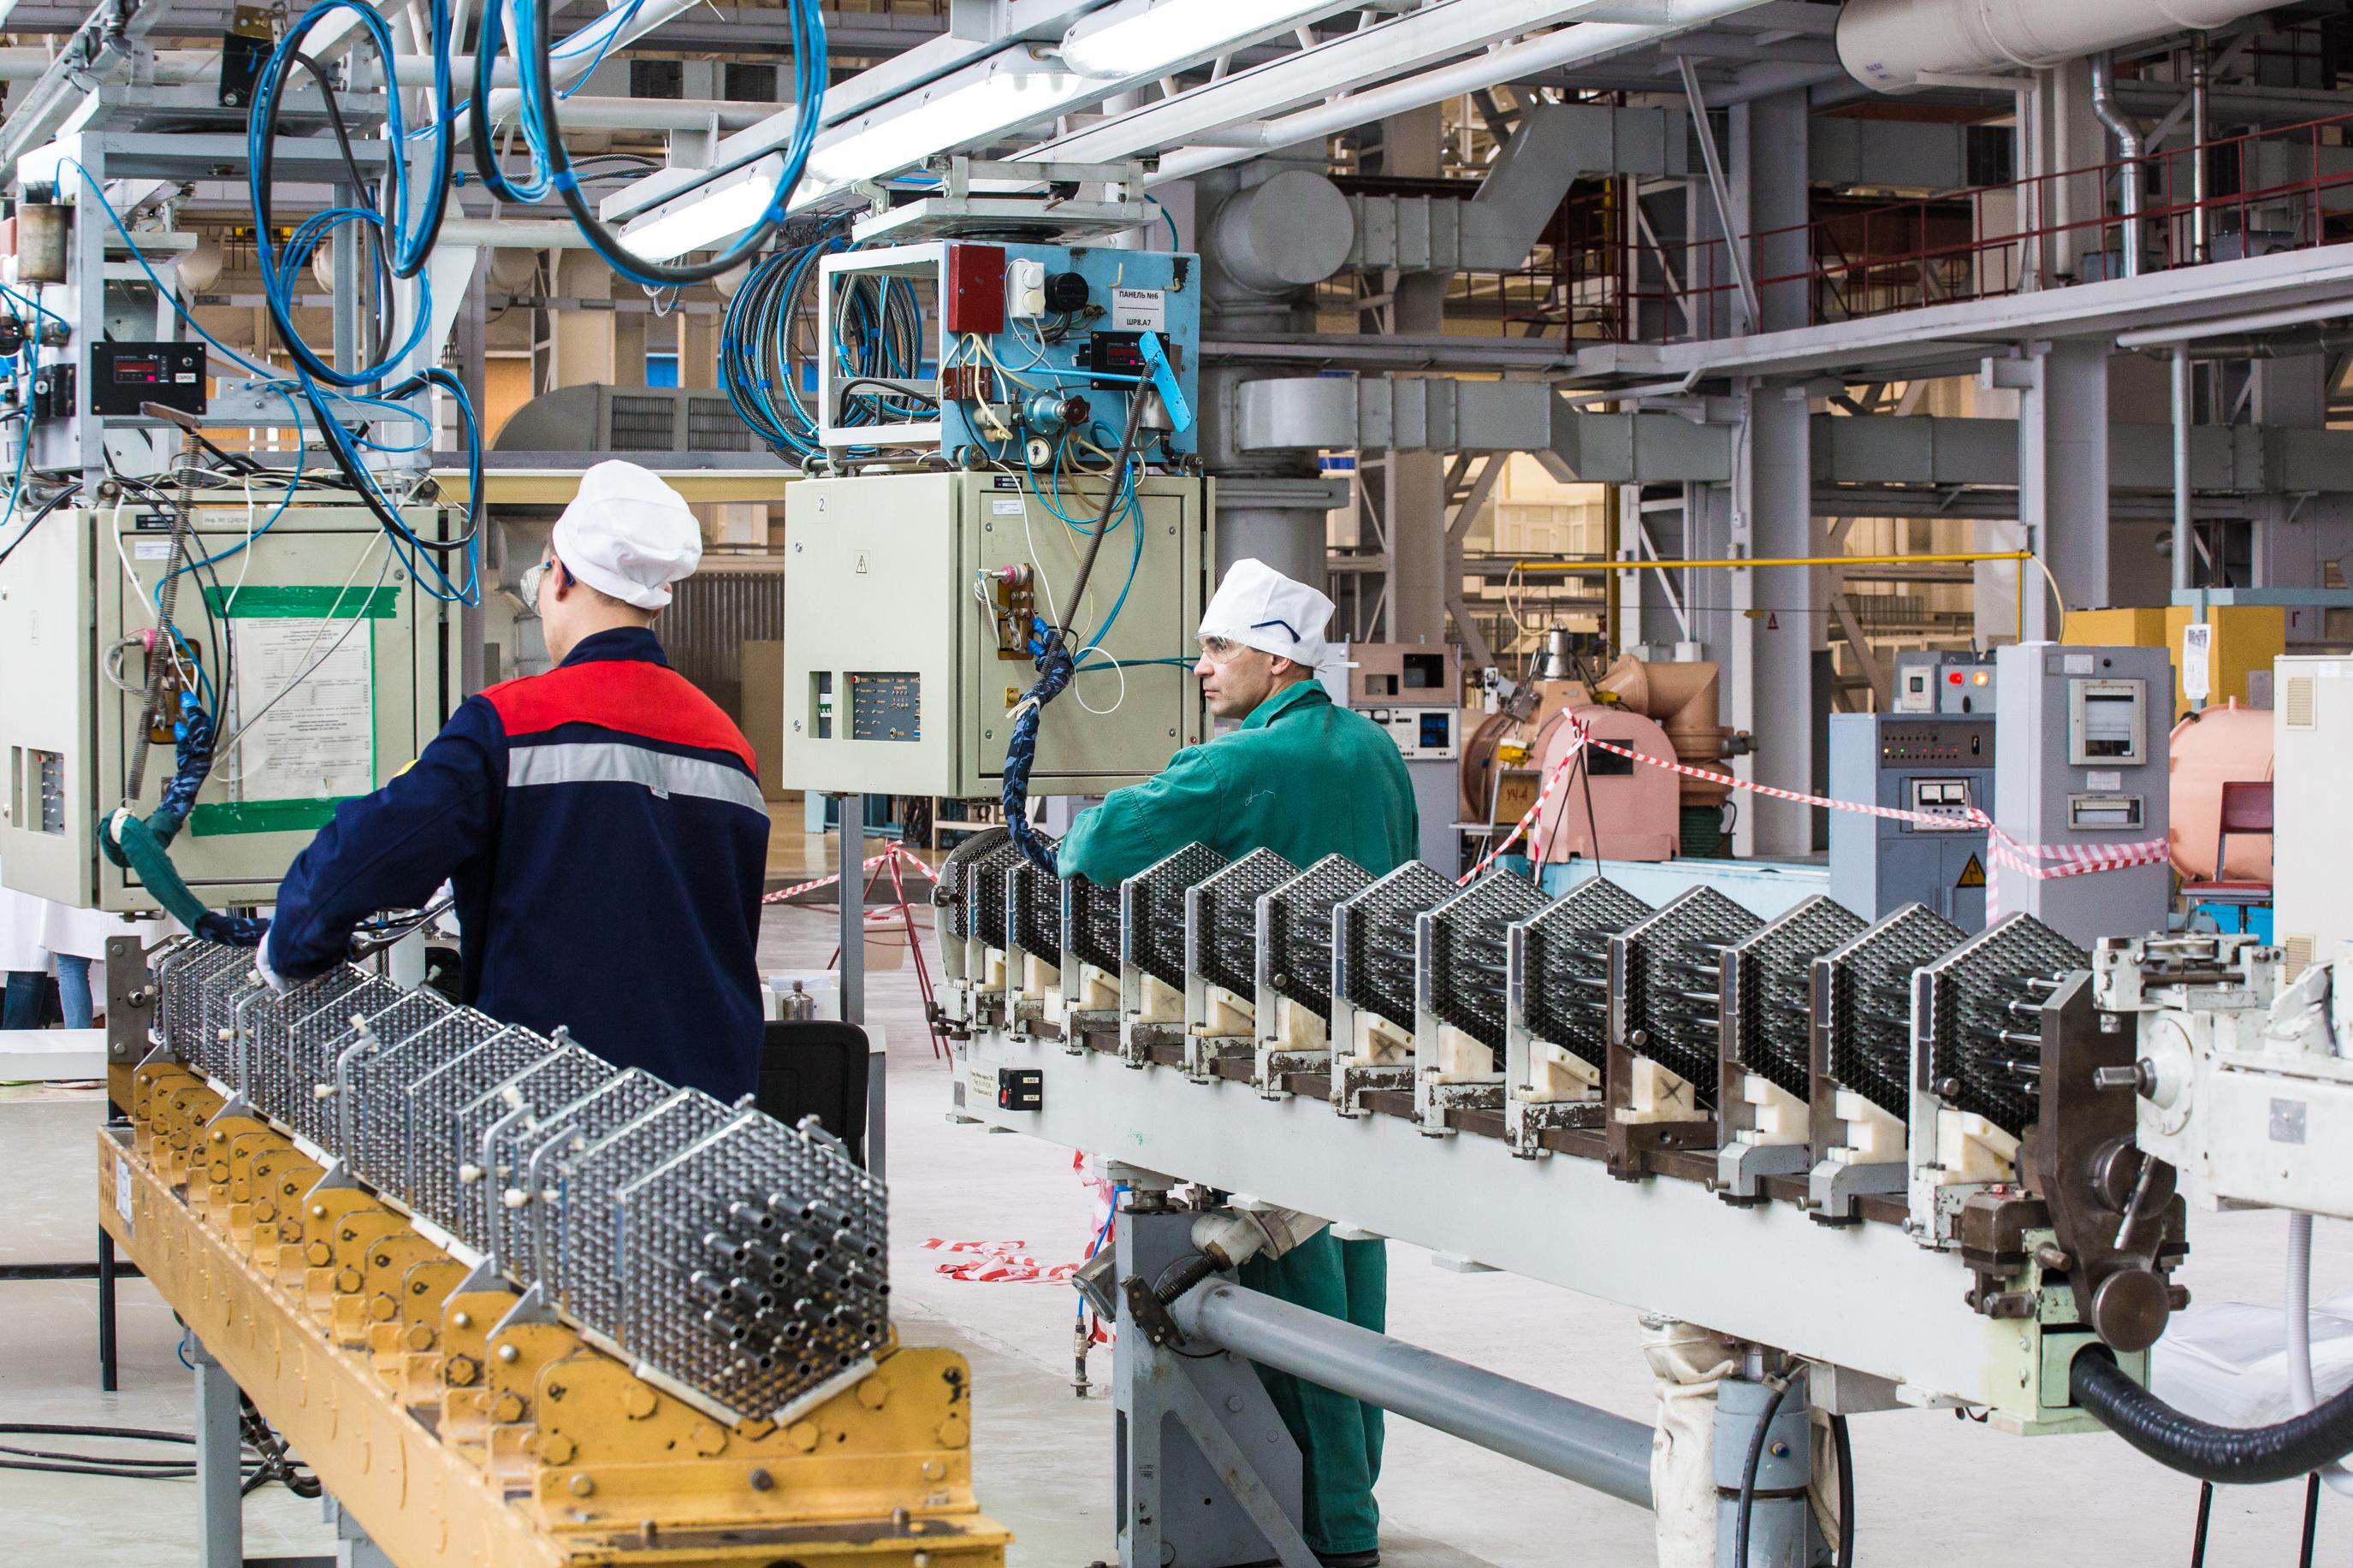 jaderná energie - TVEL podepsal kontrakt na dodávky paliva pro Kozloduj do roku 2025 - Palivový cyklus (Výroba paliva pro reaktory VVER 1000 v podniku NZCHK) 2